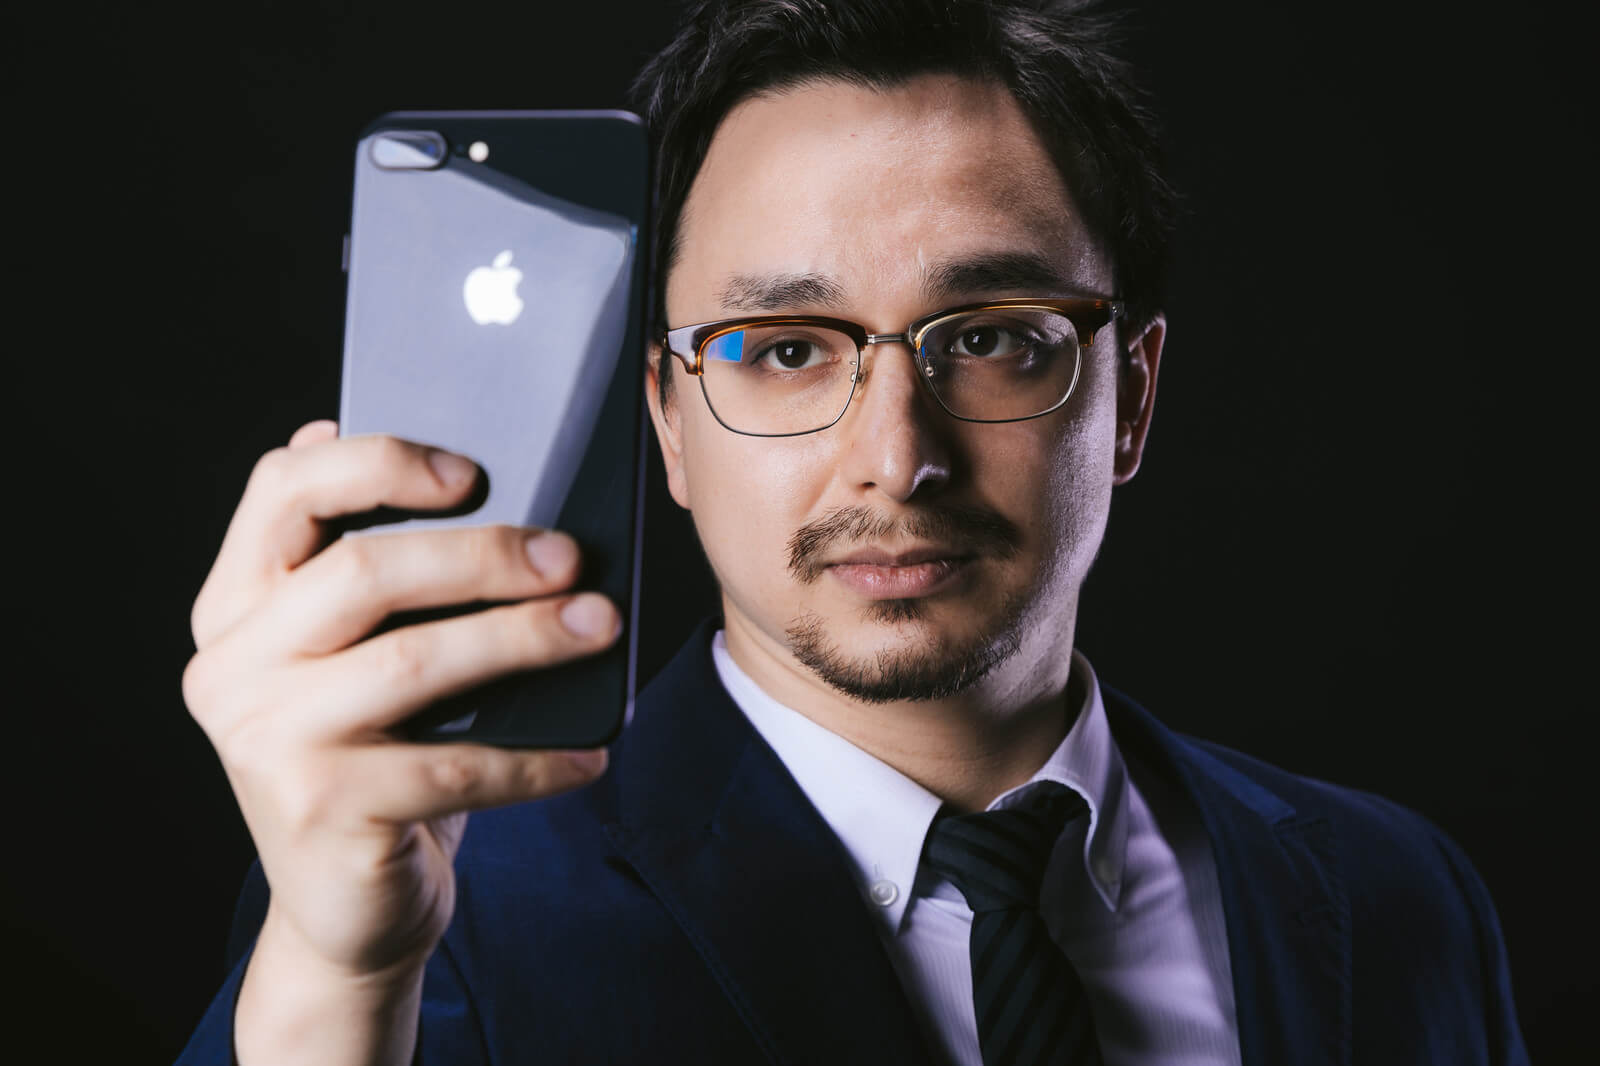 iphone-man